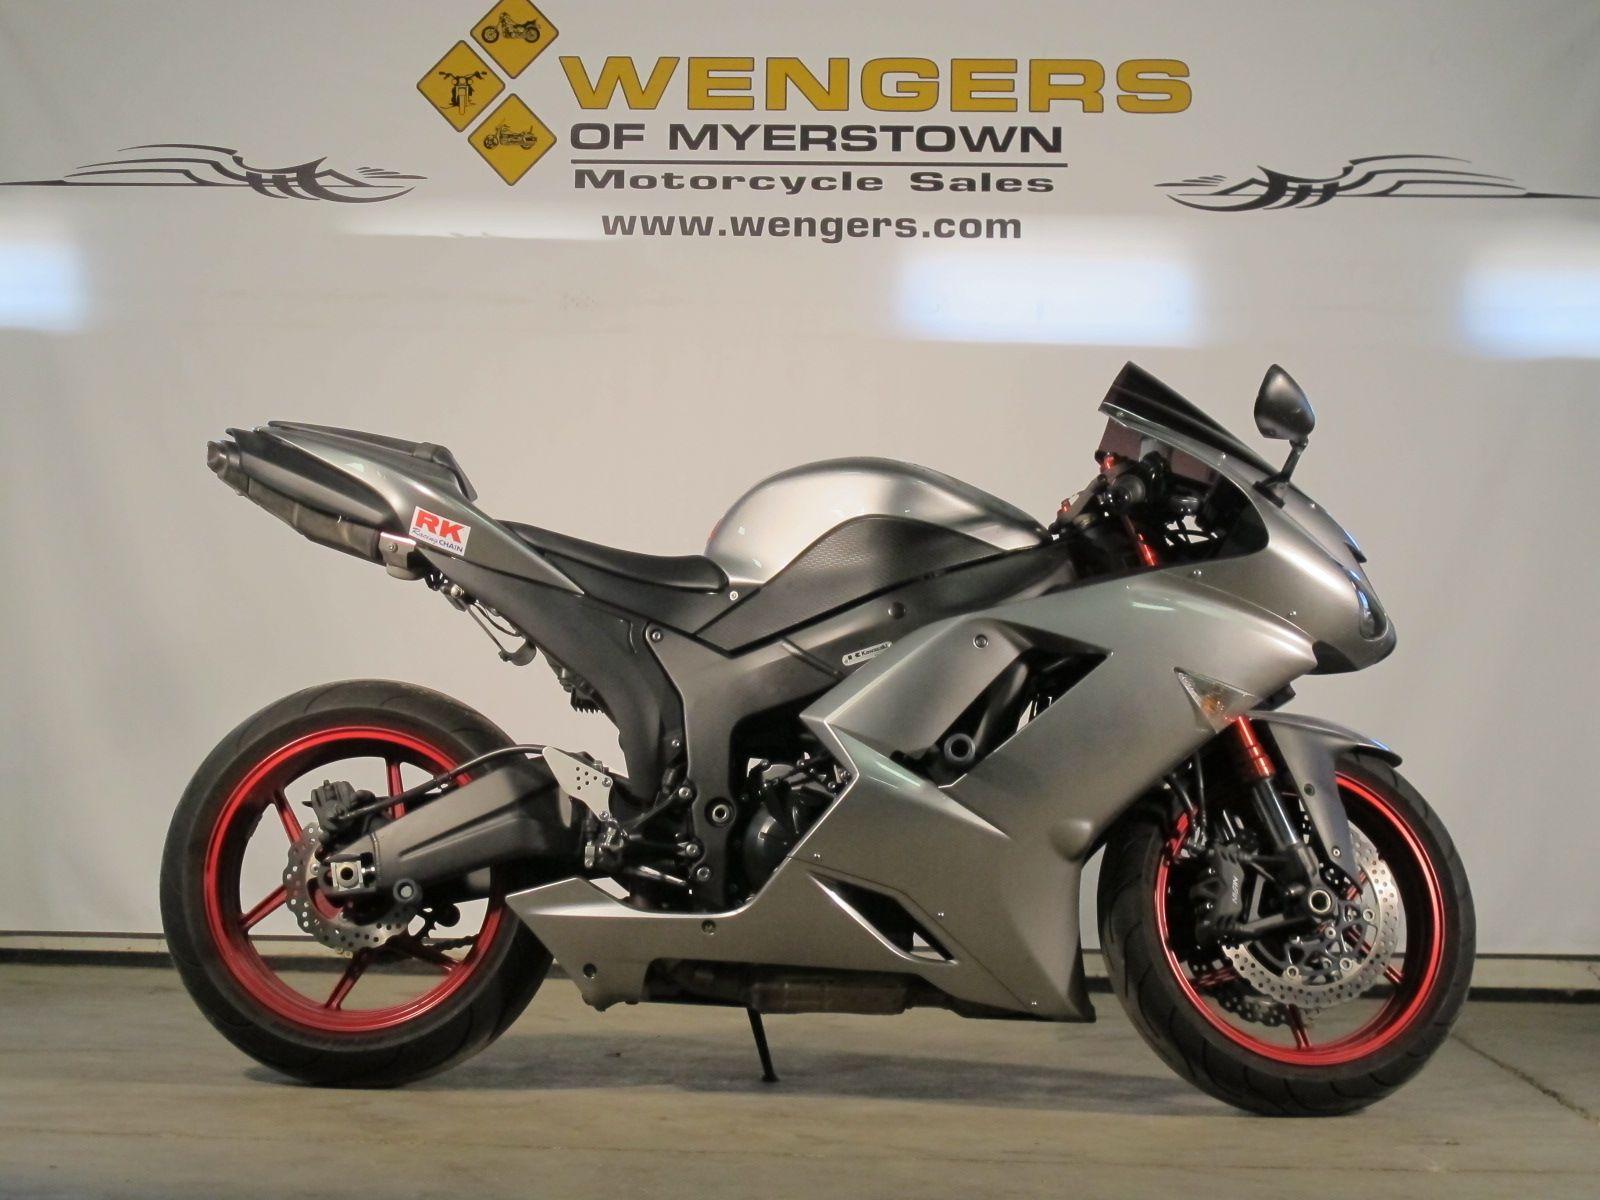 Wengers Of Myerstown >> 2007 Kawasaki Ninja ZX6R for sale at Wengers of Myerstown. Only $6995 | Bikes for Sale | Tractor ...